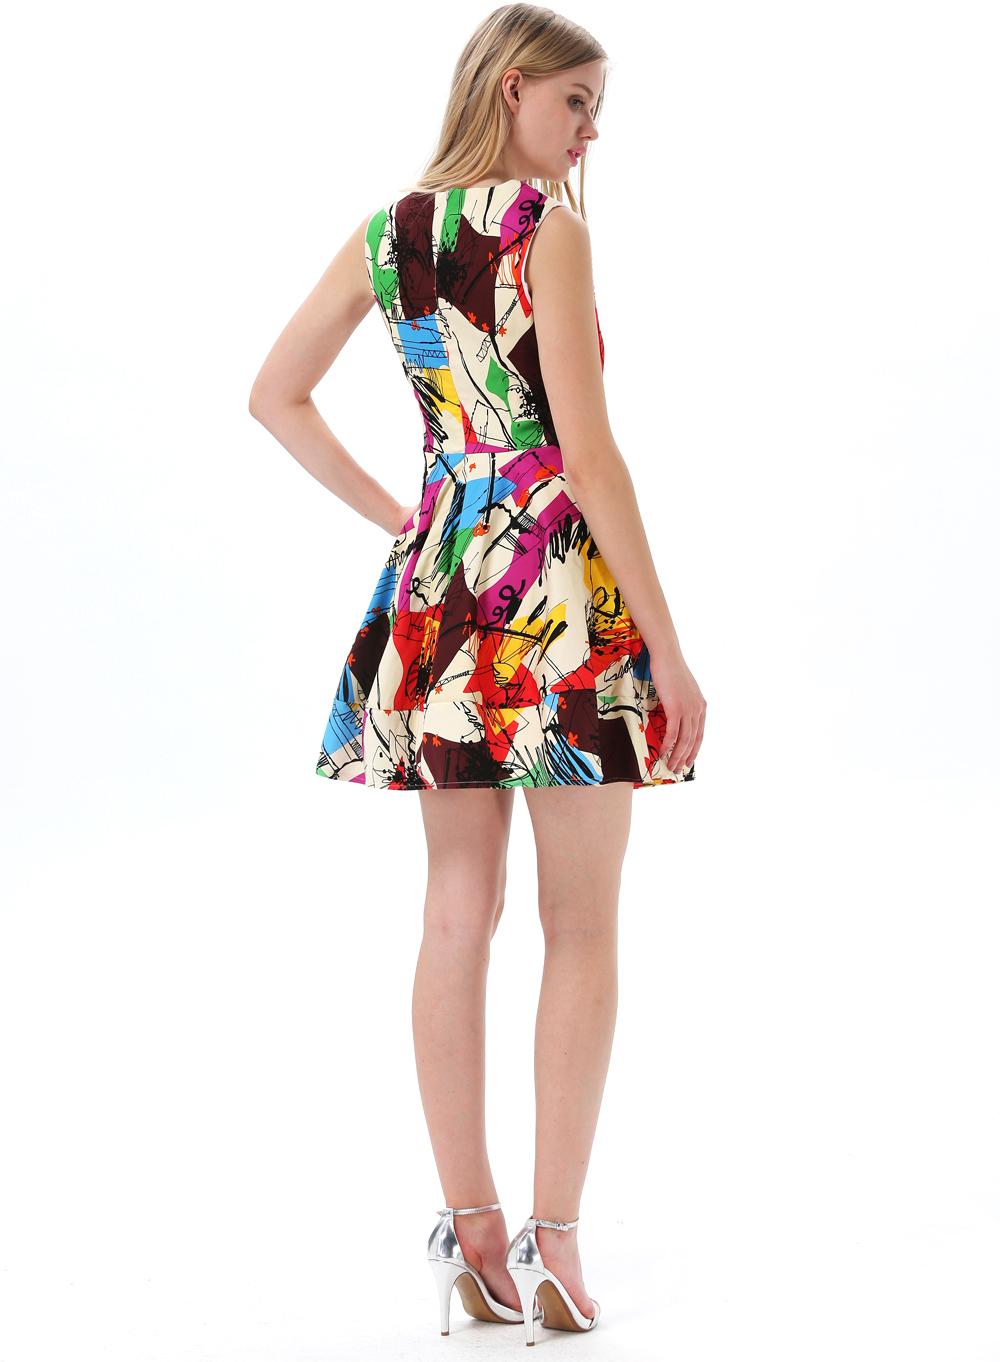 Multicolor Sleeveless Graffiti Print Flare Short Dress - Sheinside.com